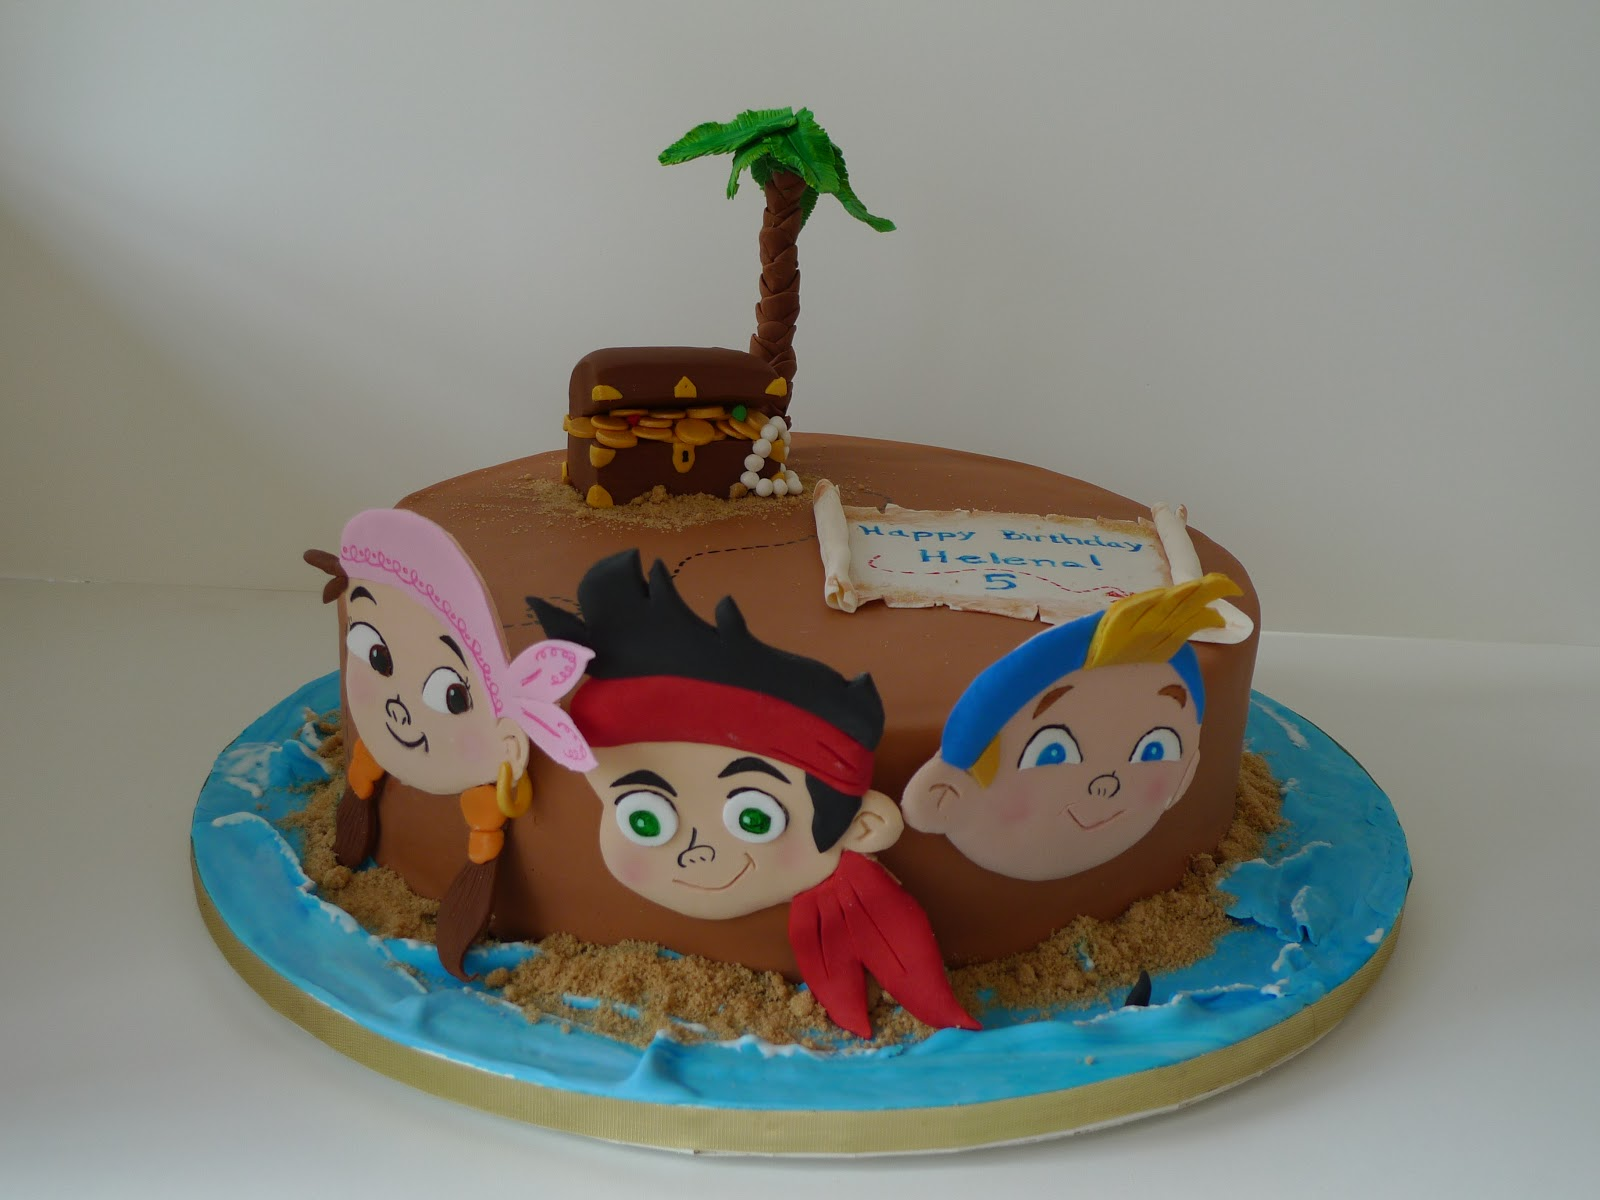 jake and the neverland pirates cake - photo #12